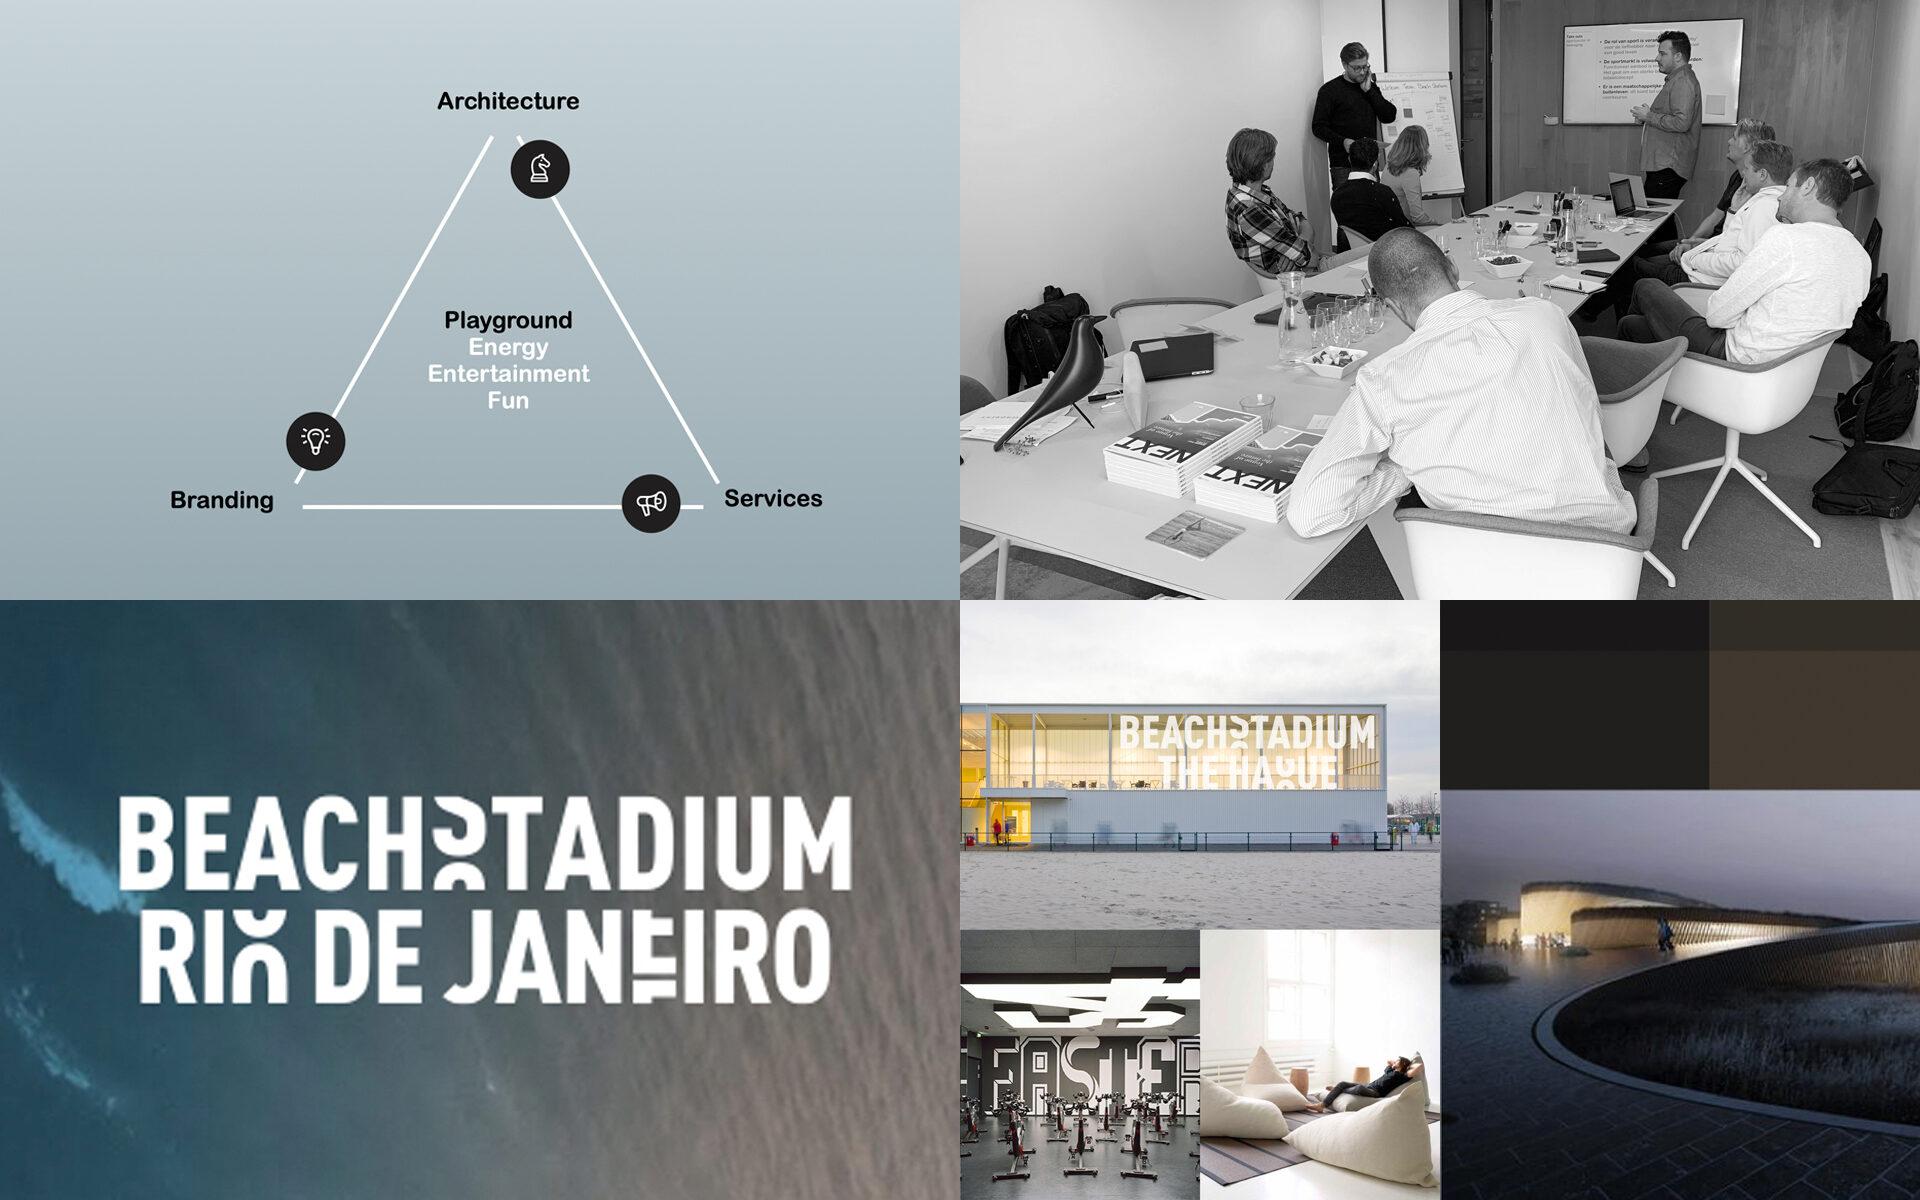 Beach Stadium Den Haag DAY Creative Strategic Consultancy Experience Concepts presentation